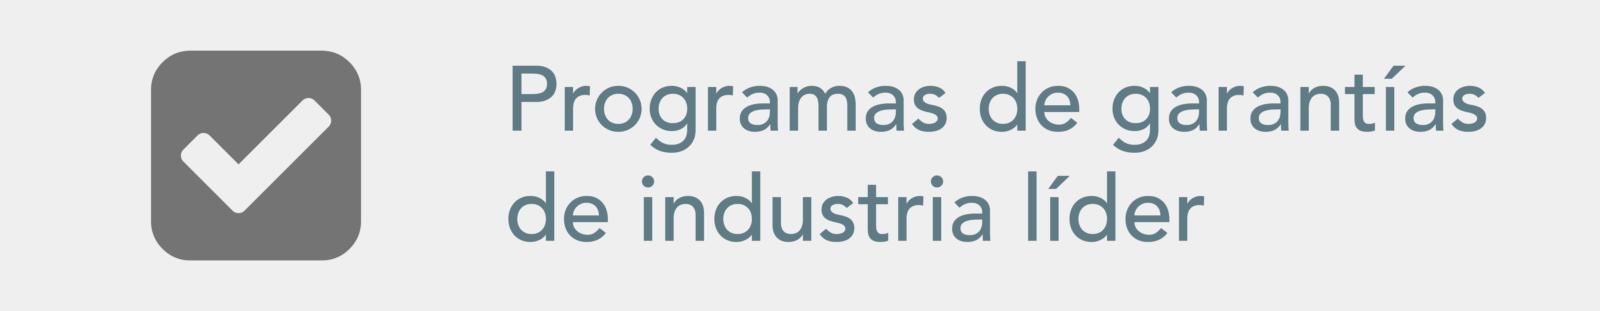 Programa de garantia de industria lider